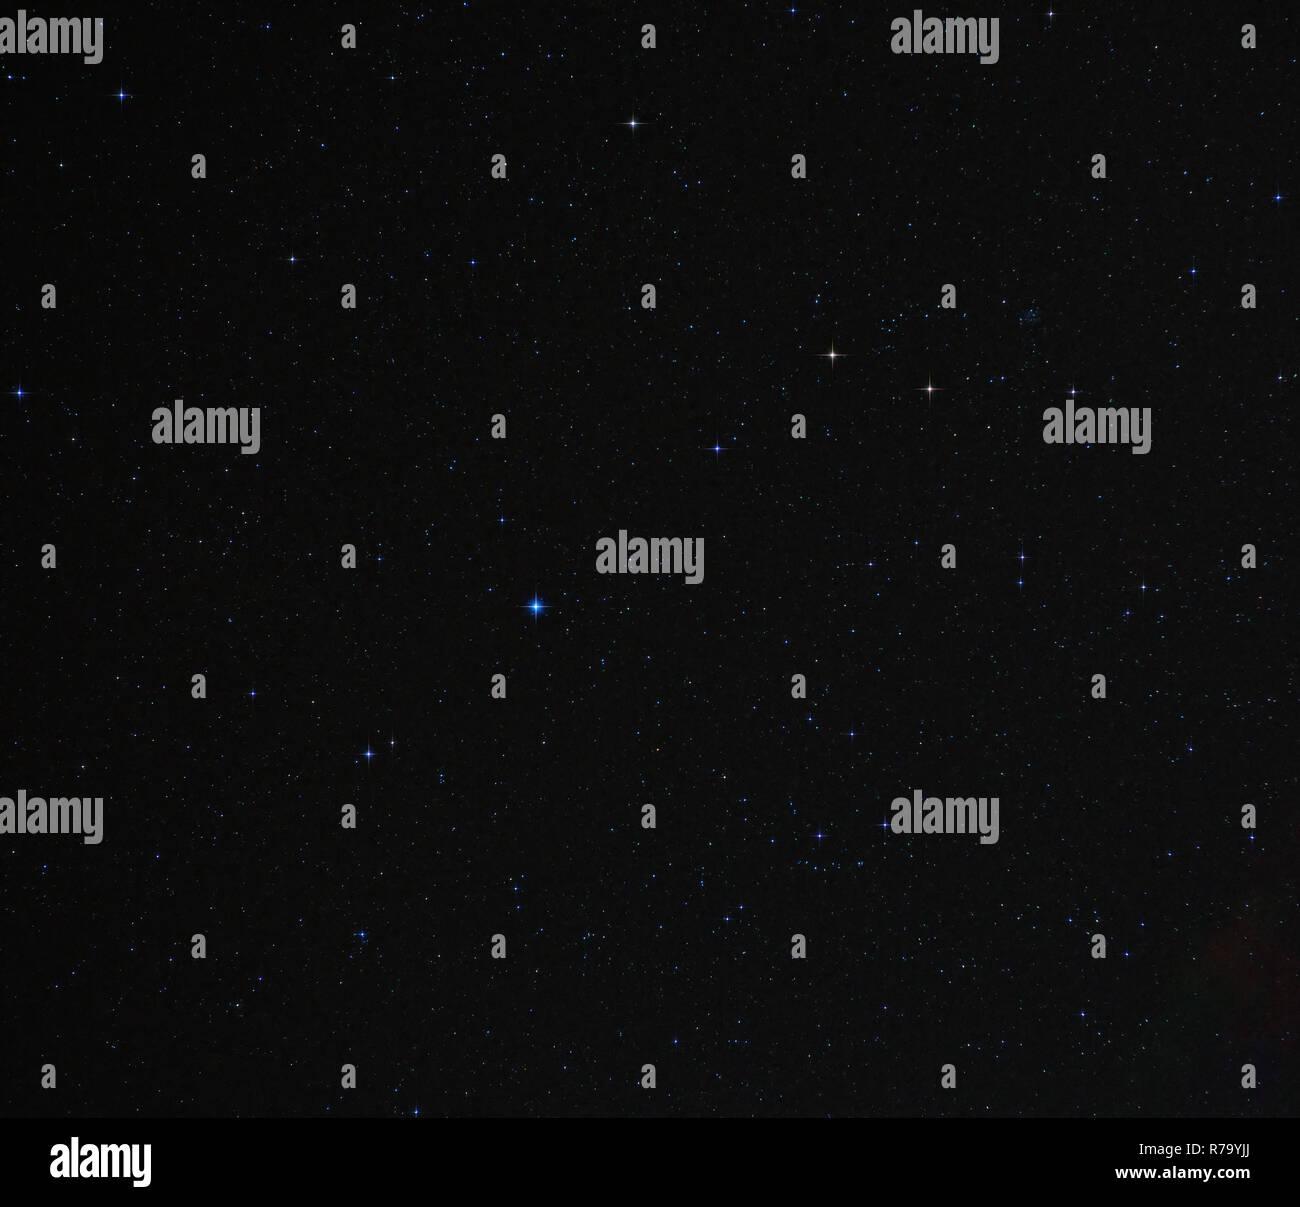 Star Field - Stock Image